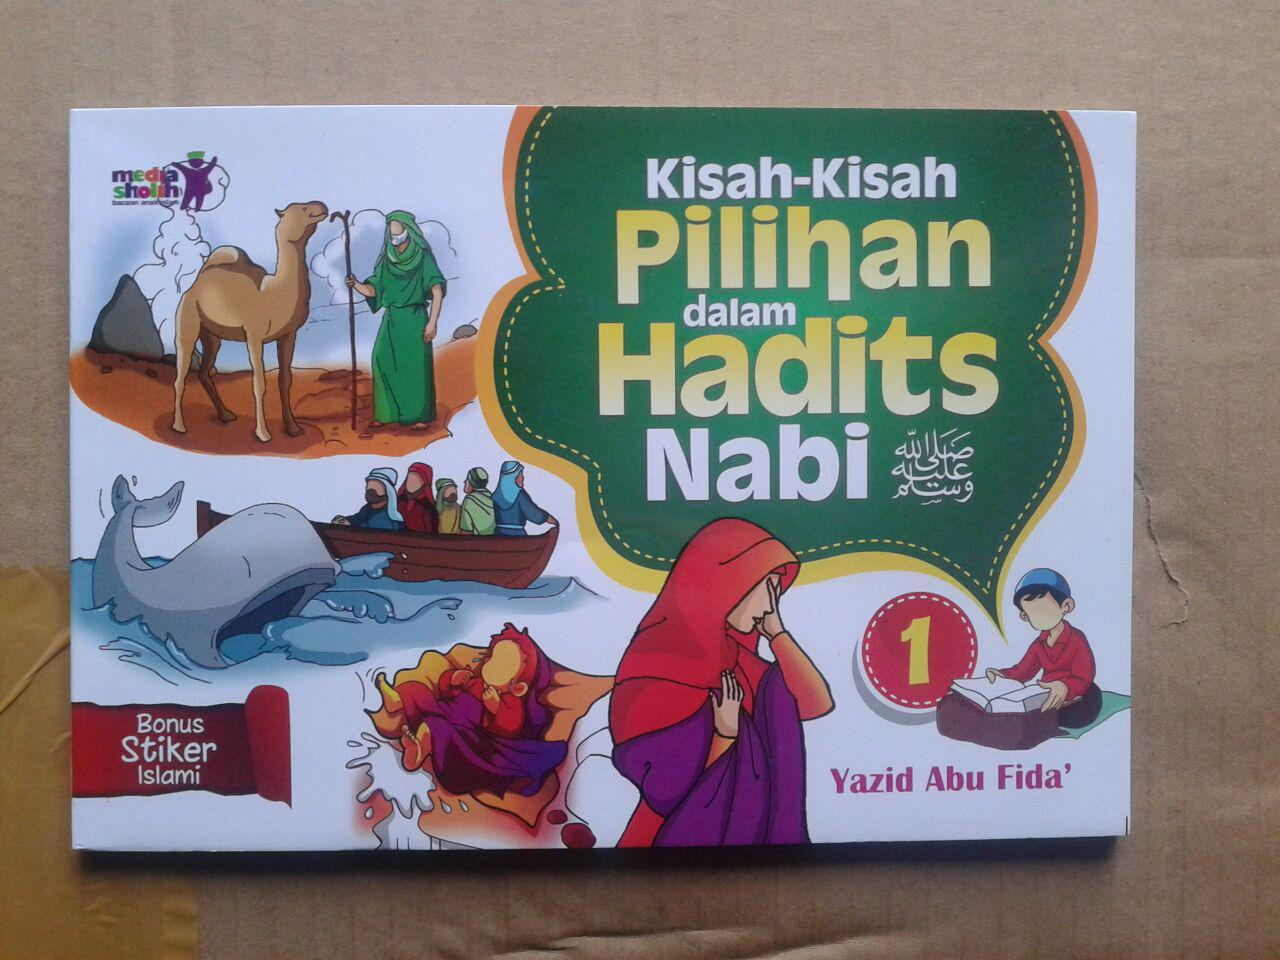 Buku Anak Kisah-Kisah Pilihan Dalam Hadits Nabi Jilid 1 cover